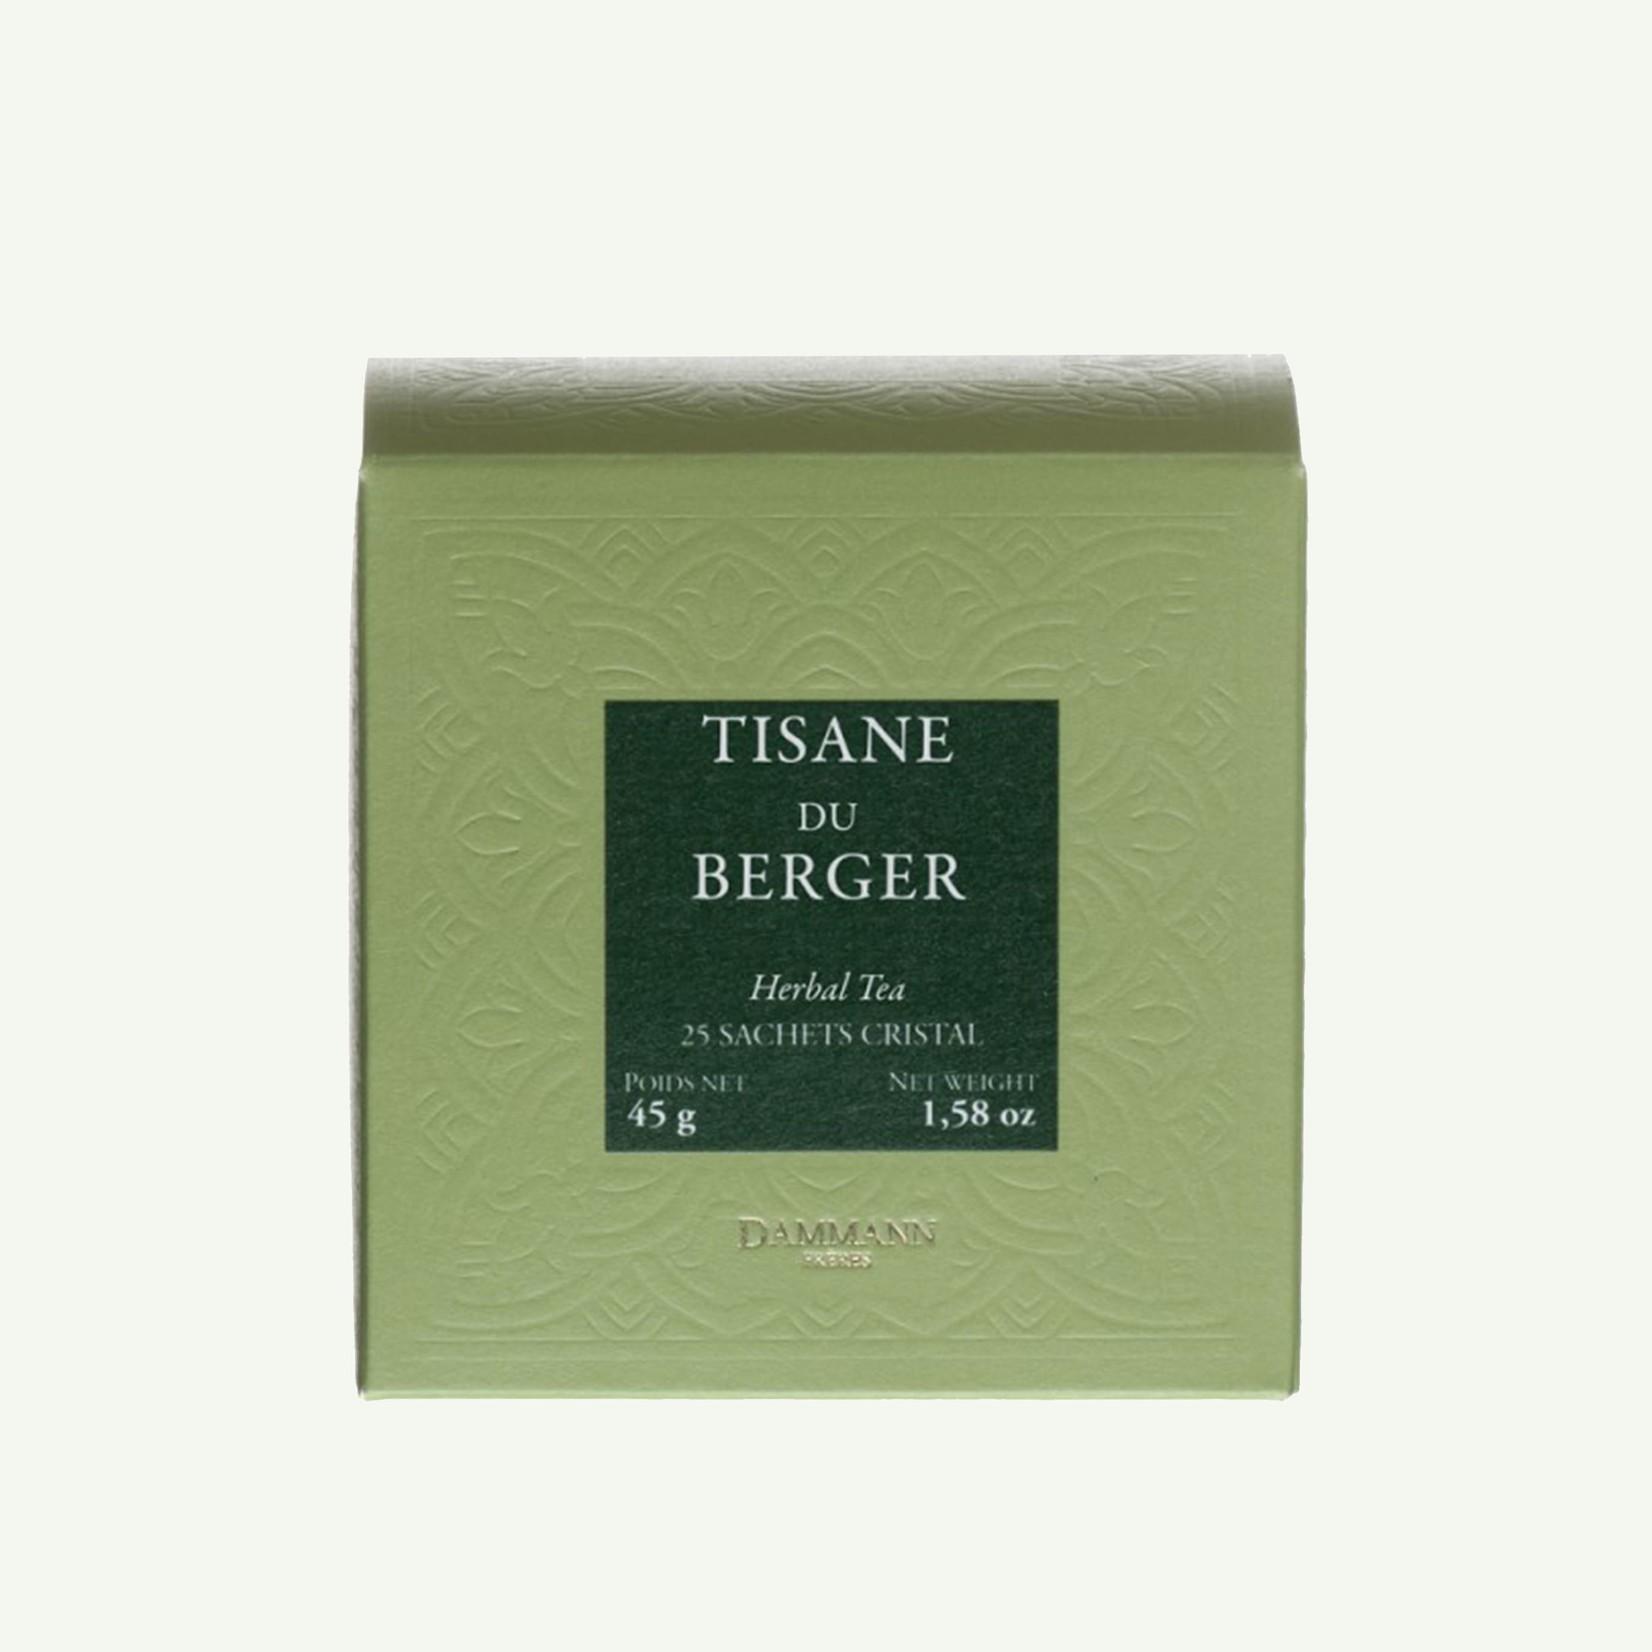 Dammann Dammann 'Tisane du Berger' 25TB